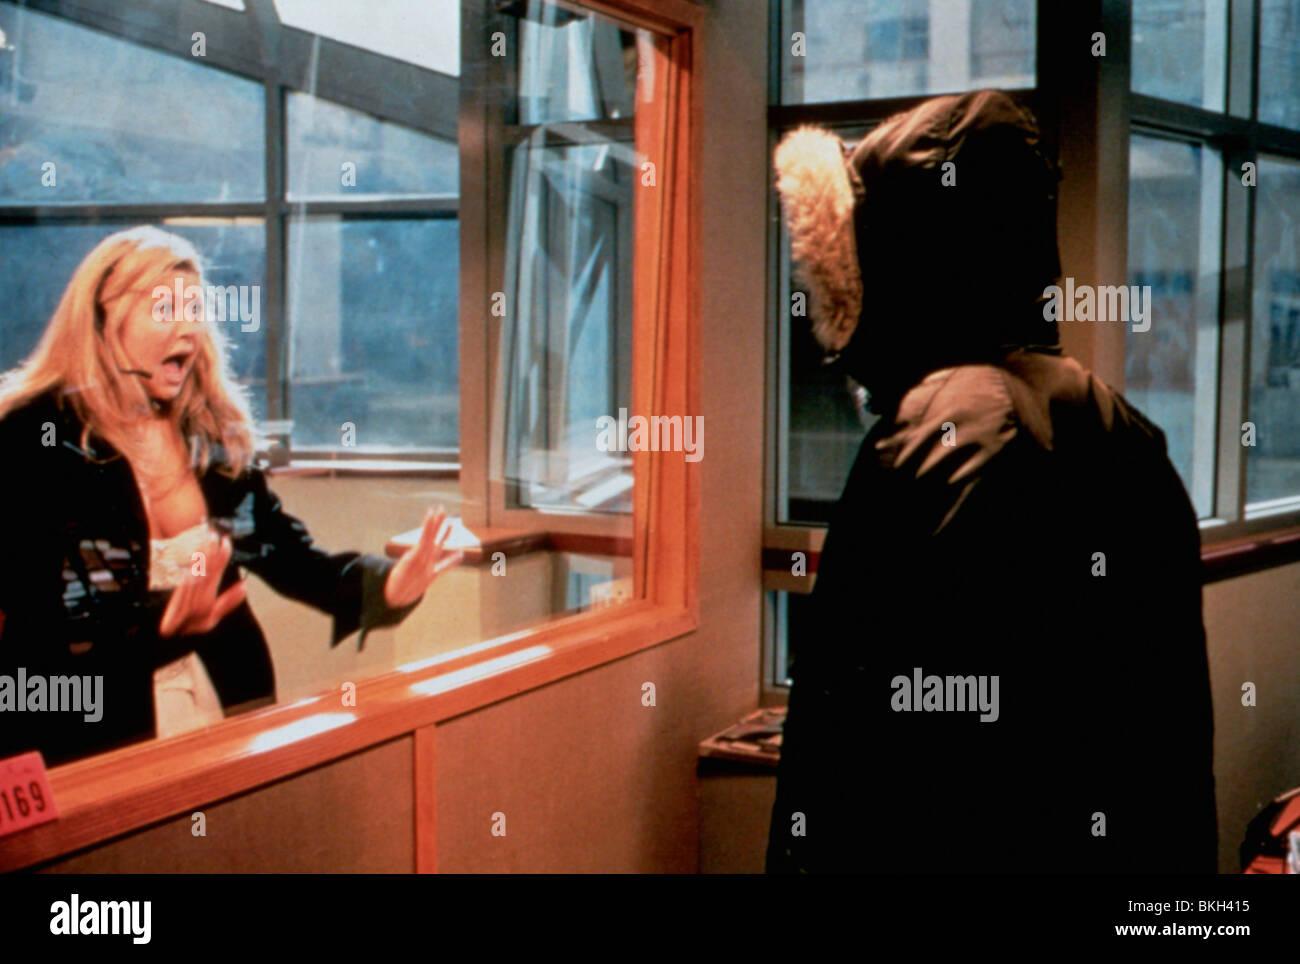 Leggenda urbana -1998 Immagini Stock